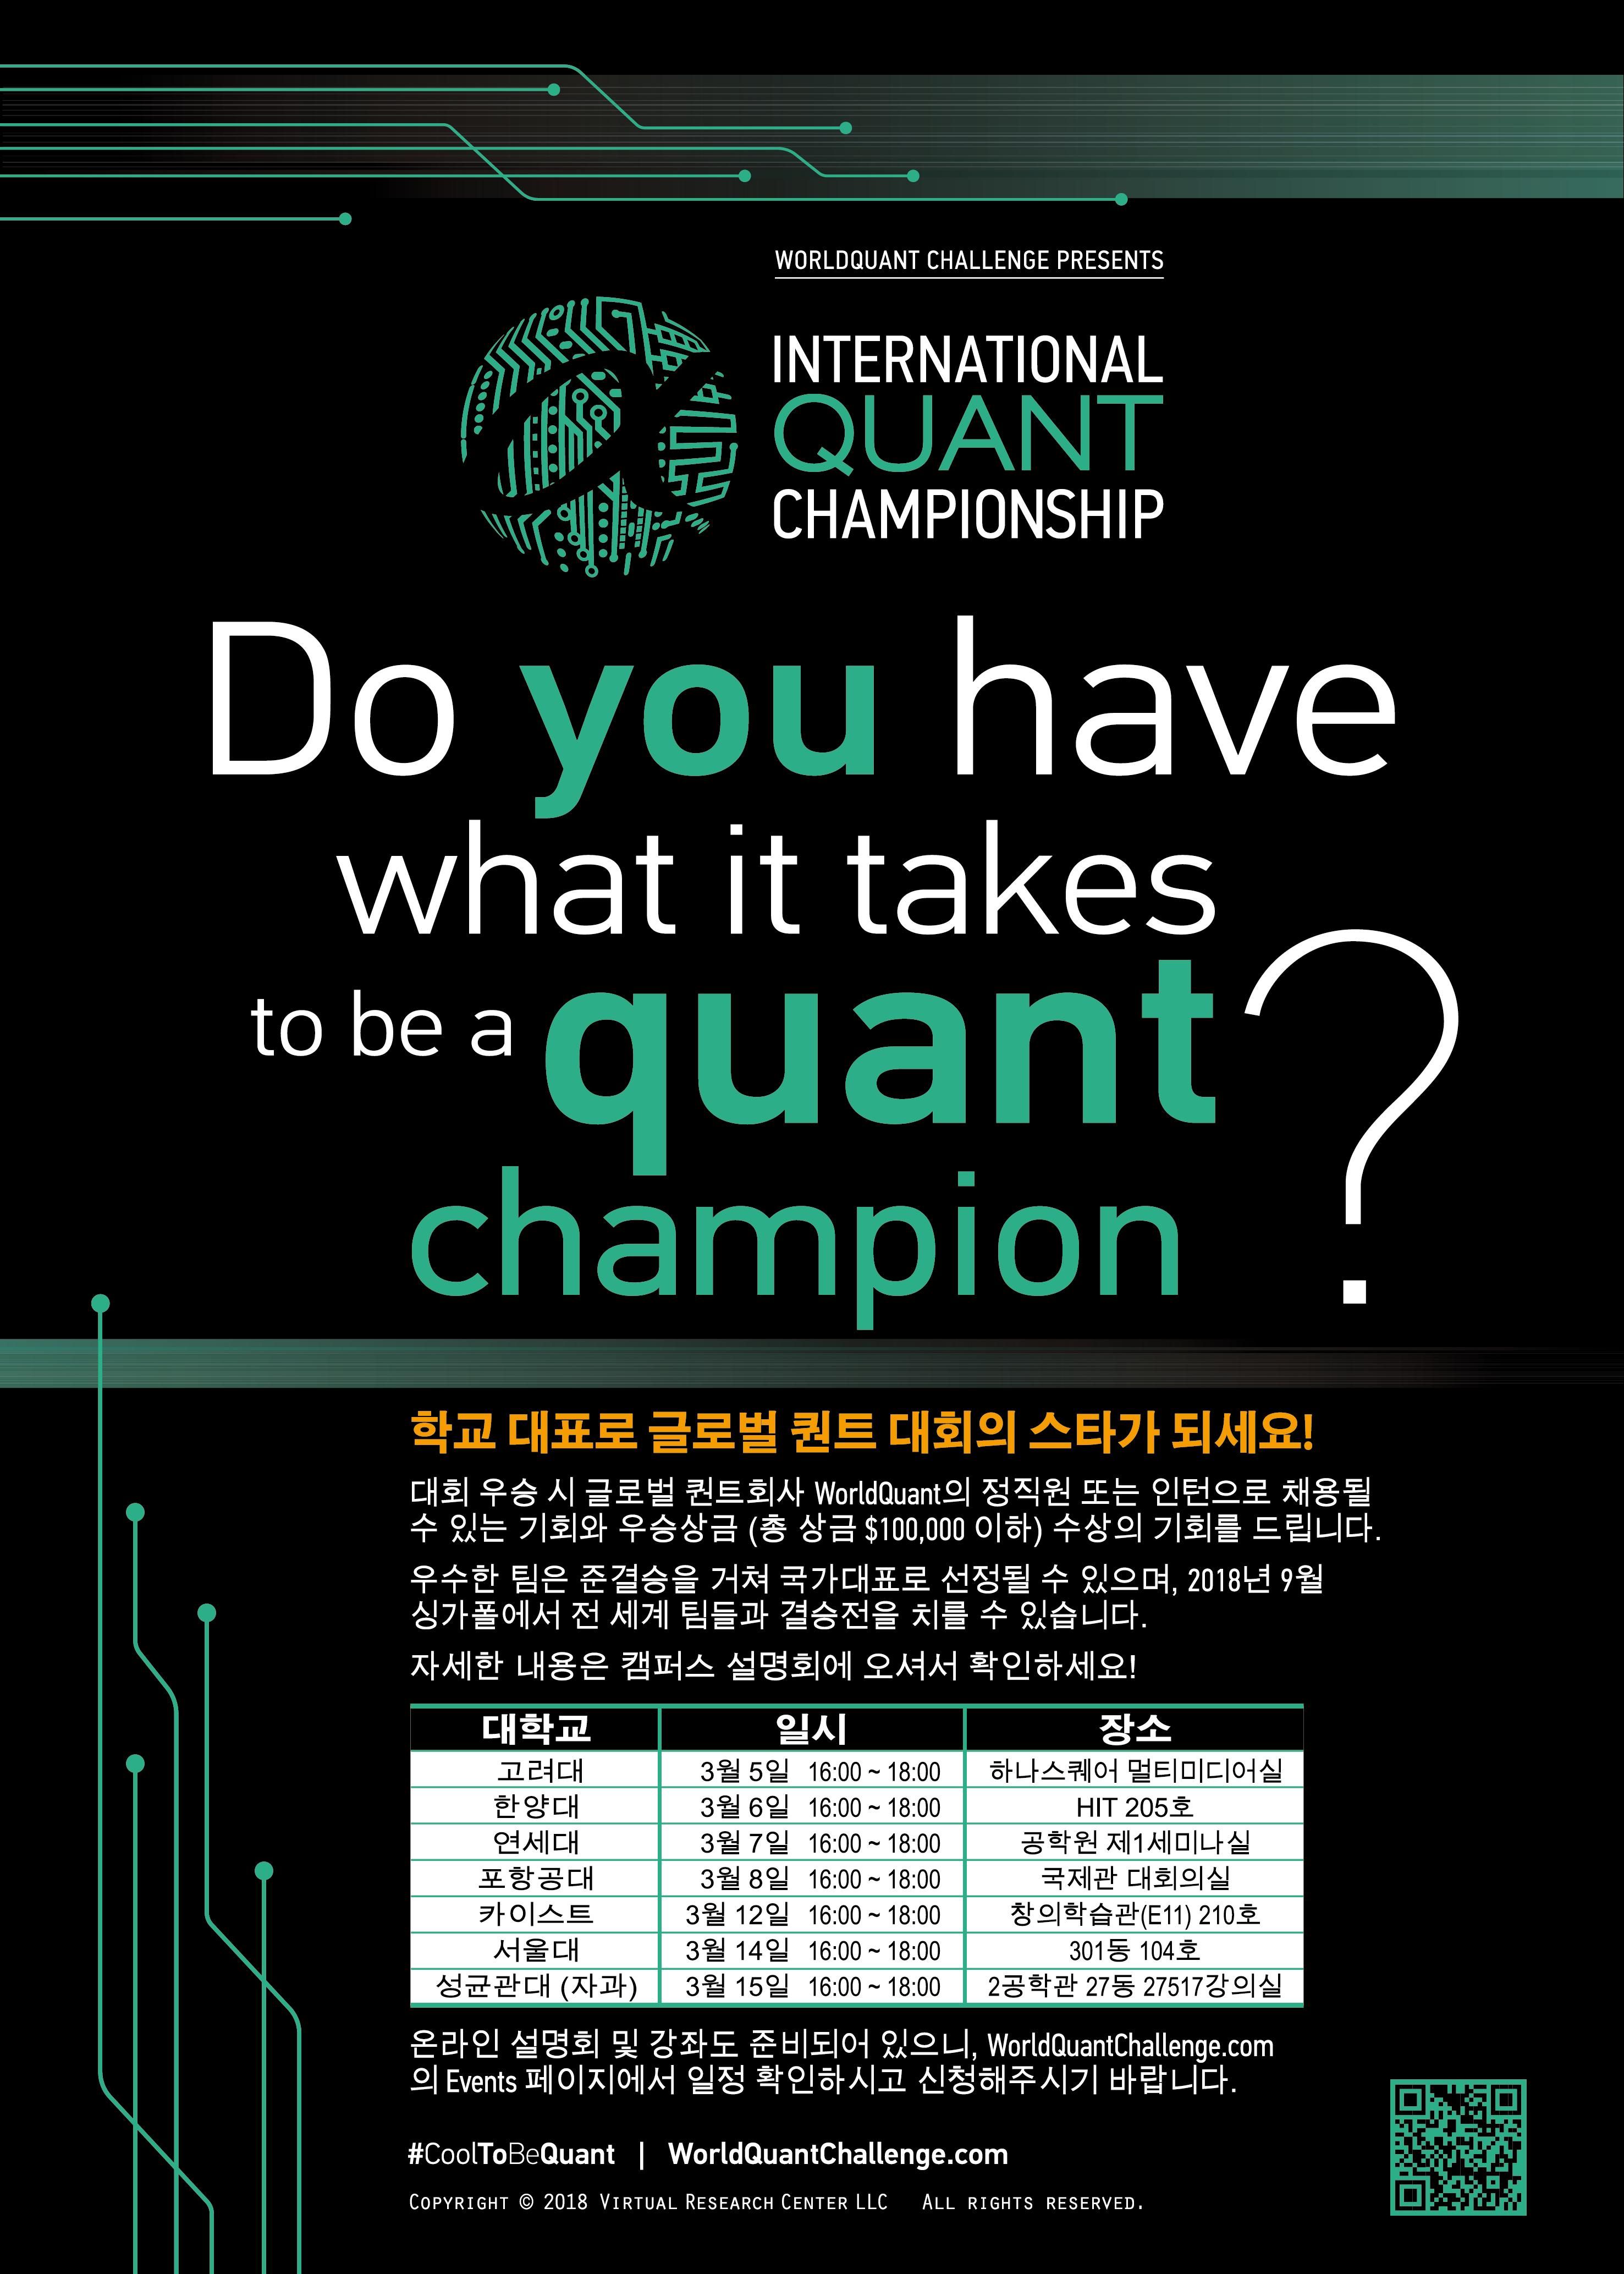 2018 International Quant Championship